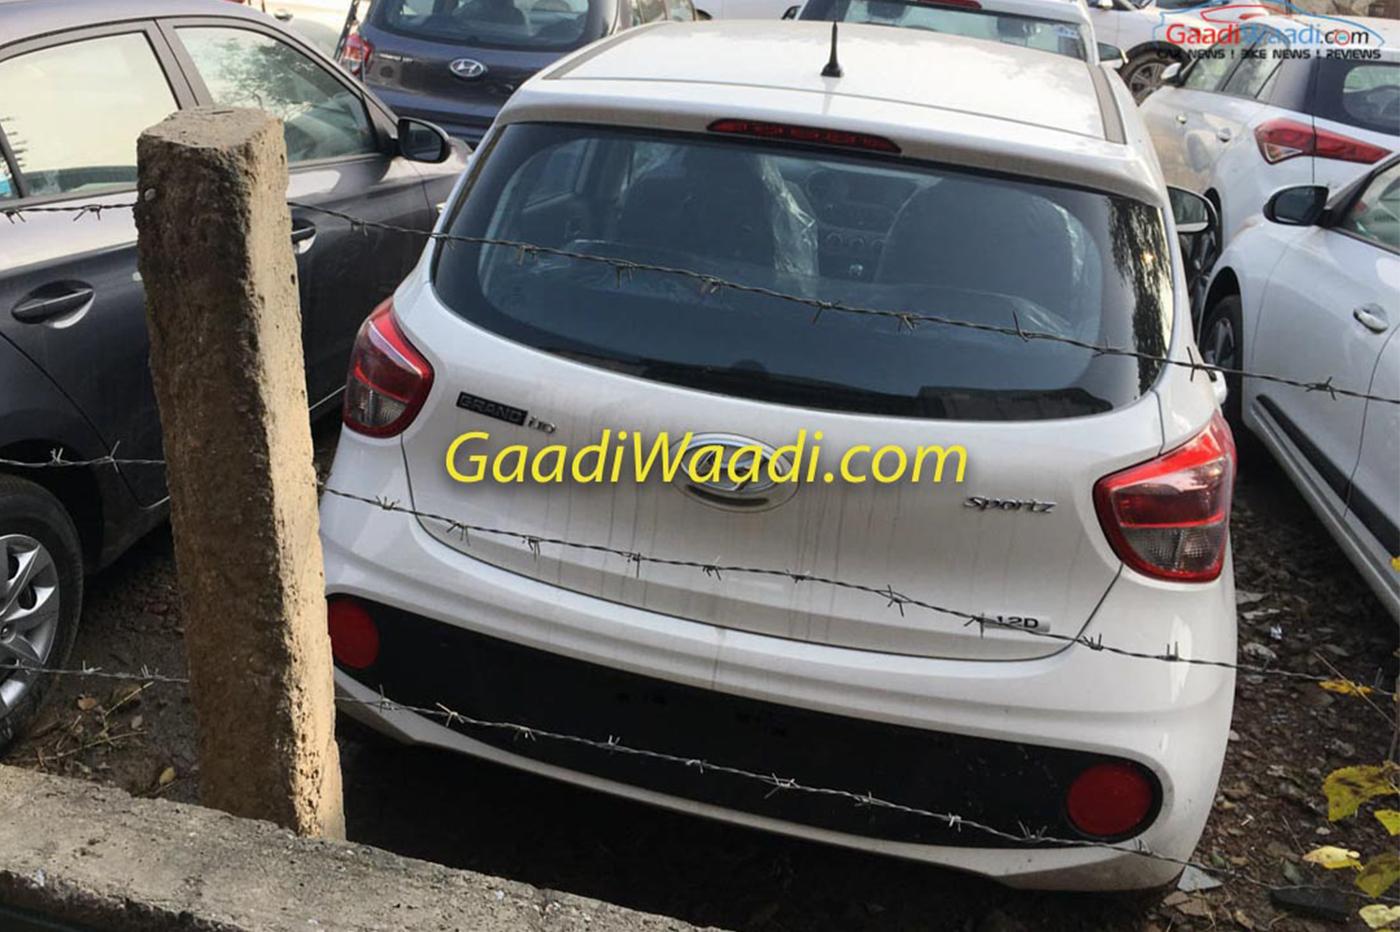 2017-hyundai-grand-i10-facelift-rear-spied-.jpg